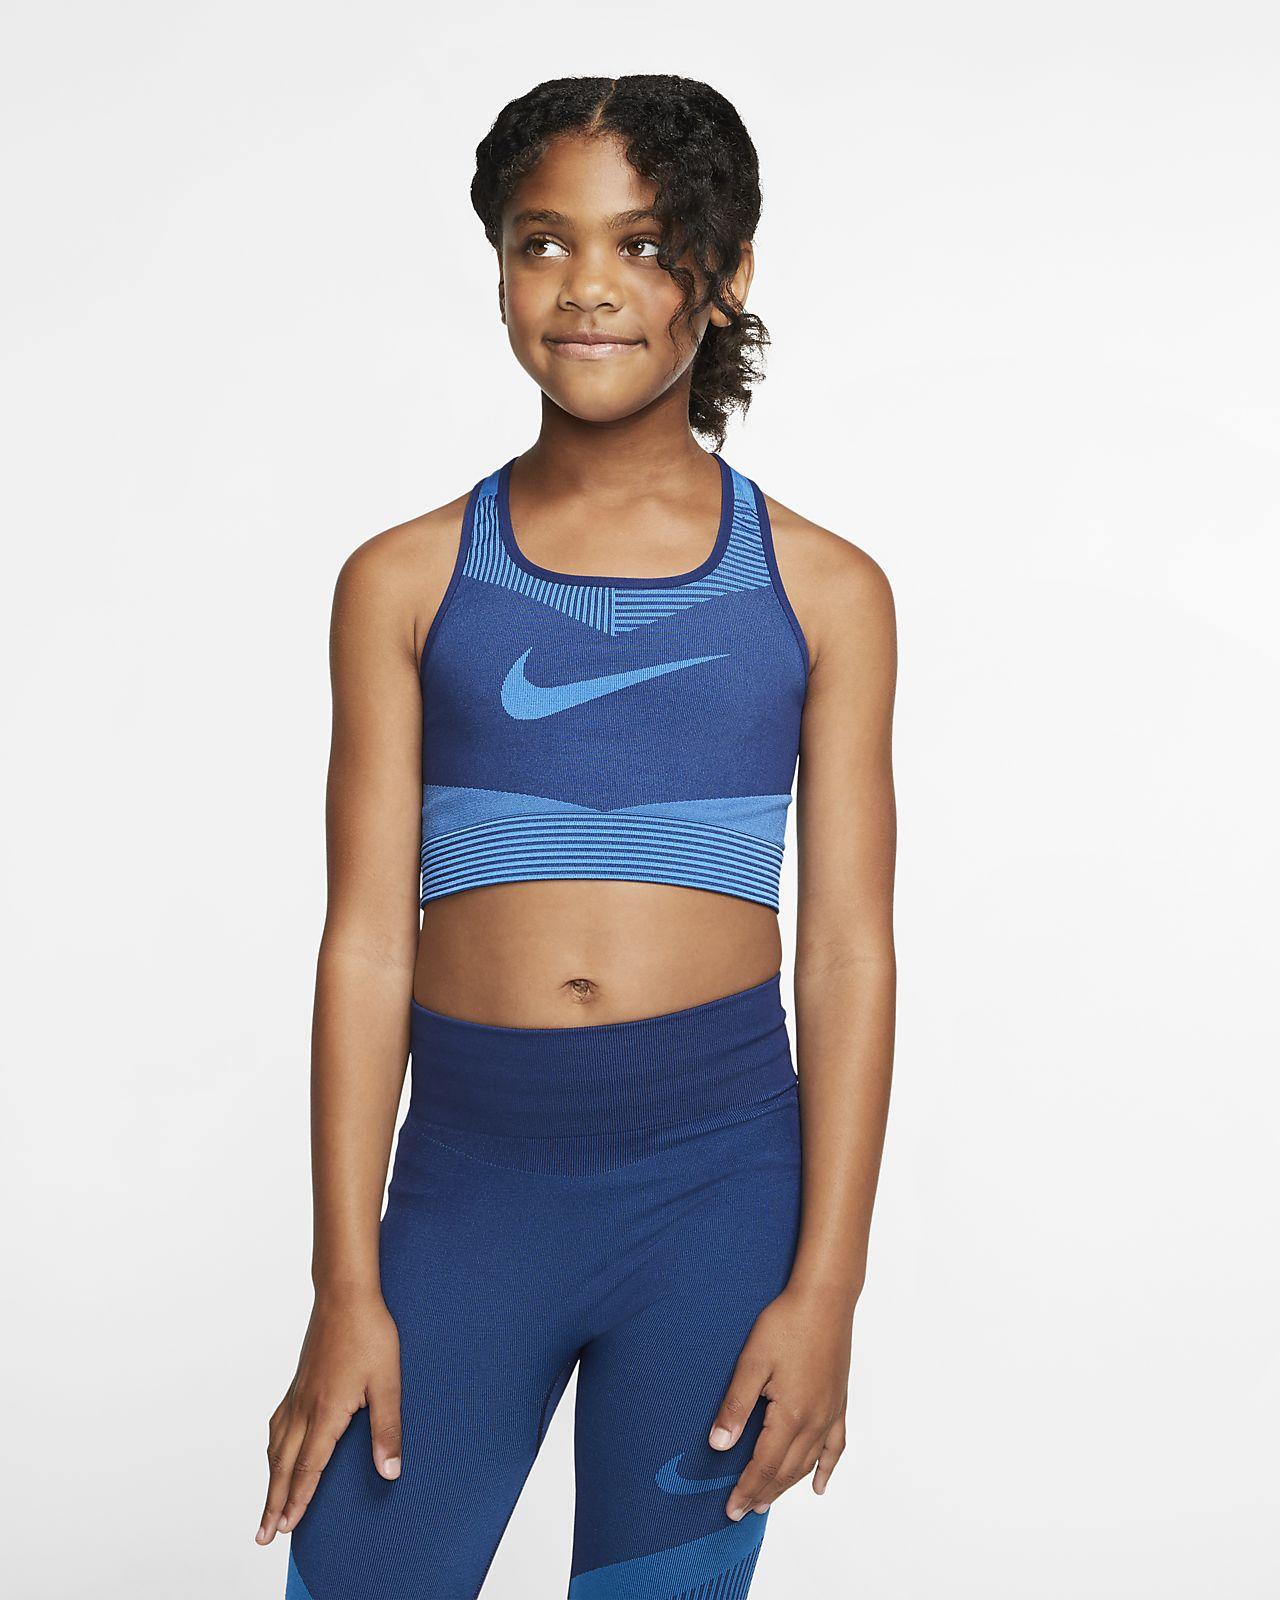 Nike FE/NOM Big Kids' (Girls') Seamless Sports Bra